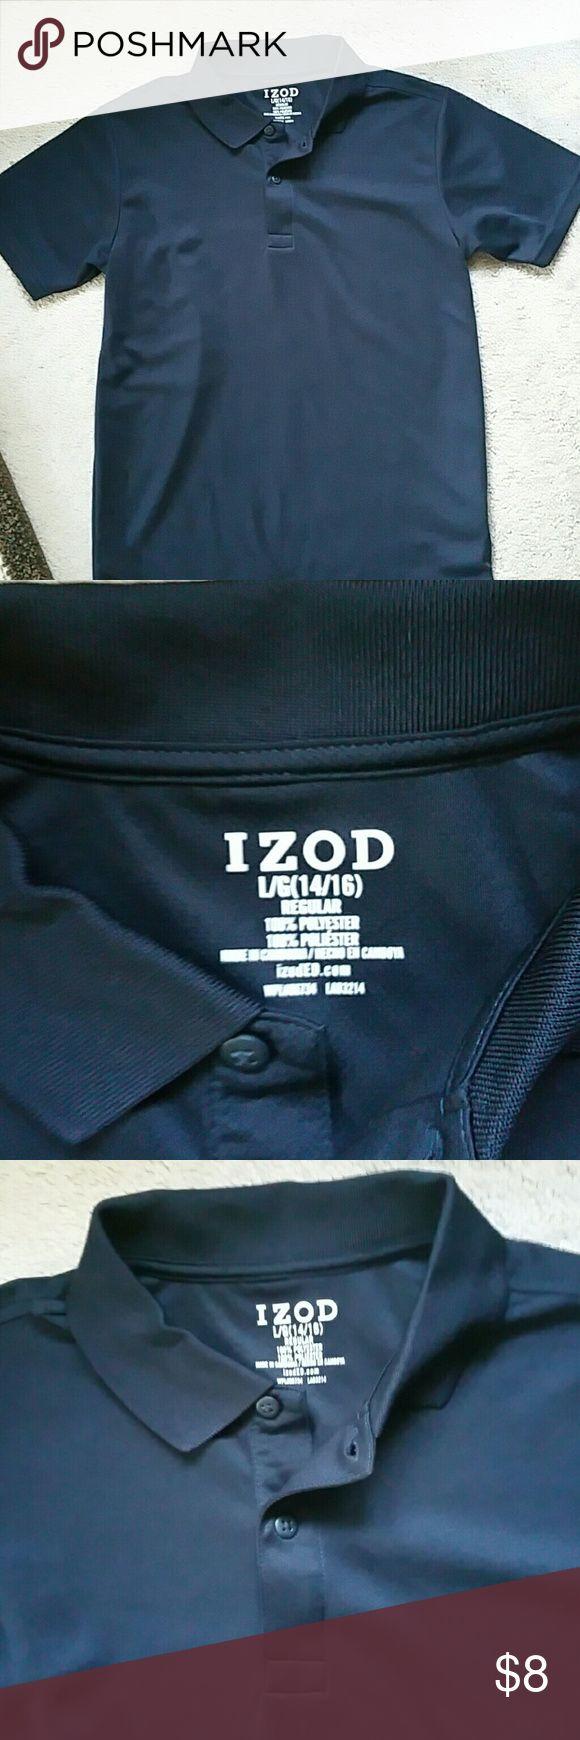 Boy's Izod Navy blue shirt..Brand new Boy's Navy blue uniform style polo.. brand new never wore Izod Shirts & Tops Polos